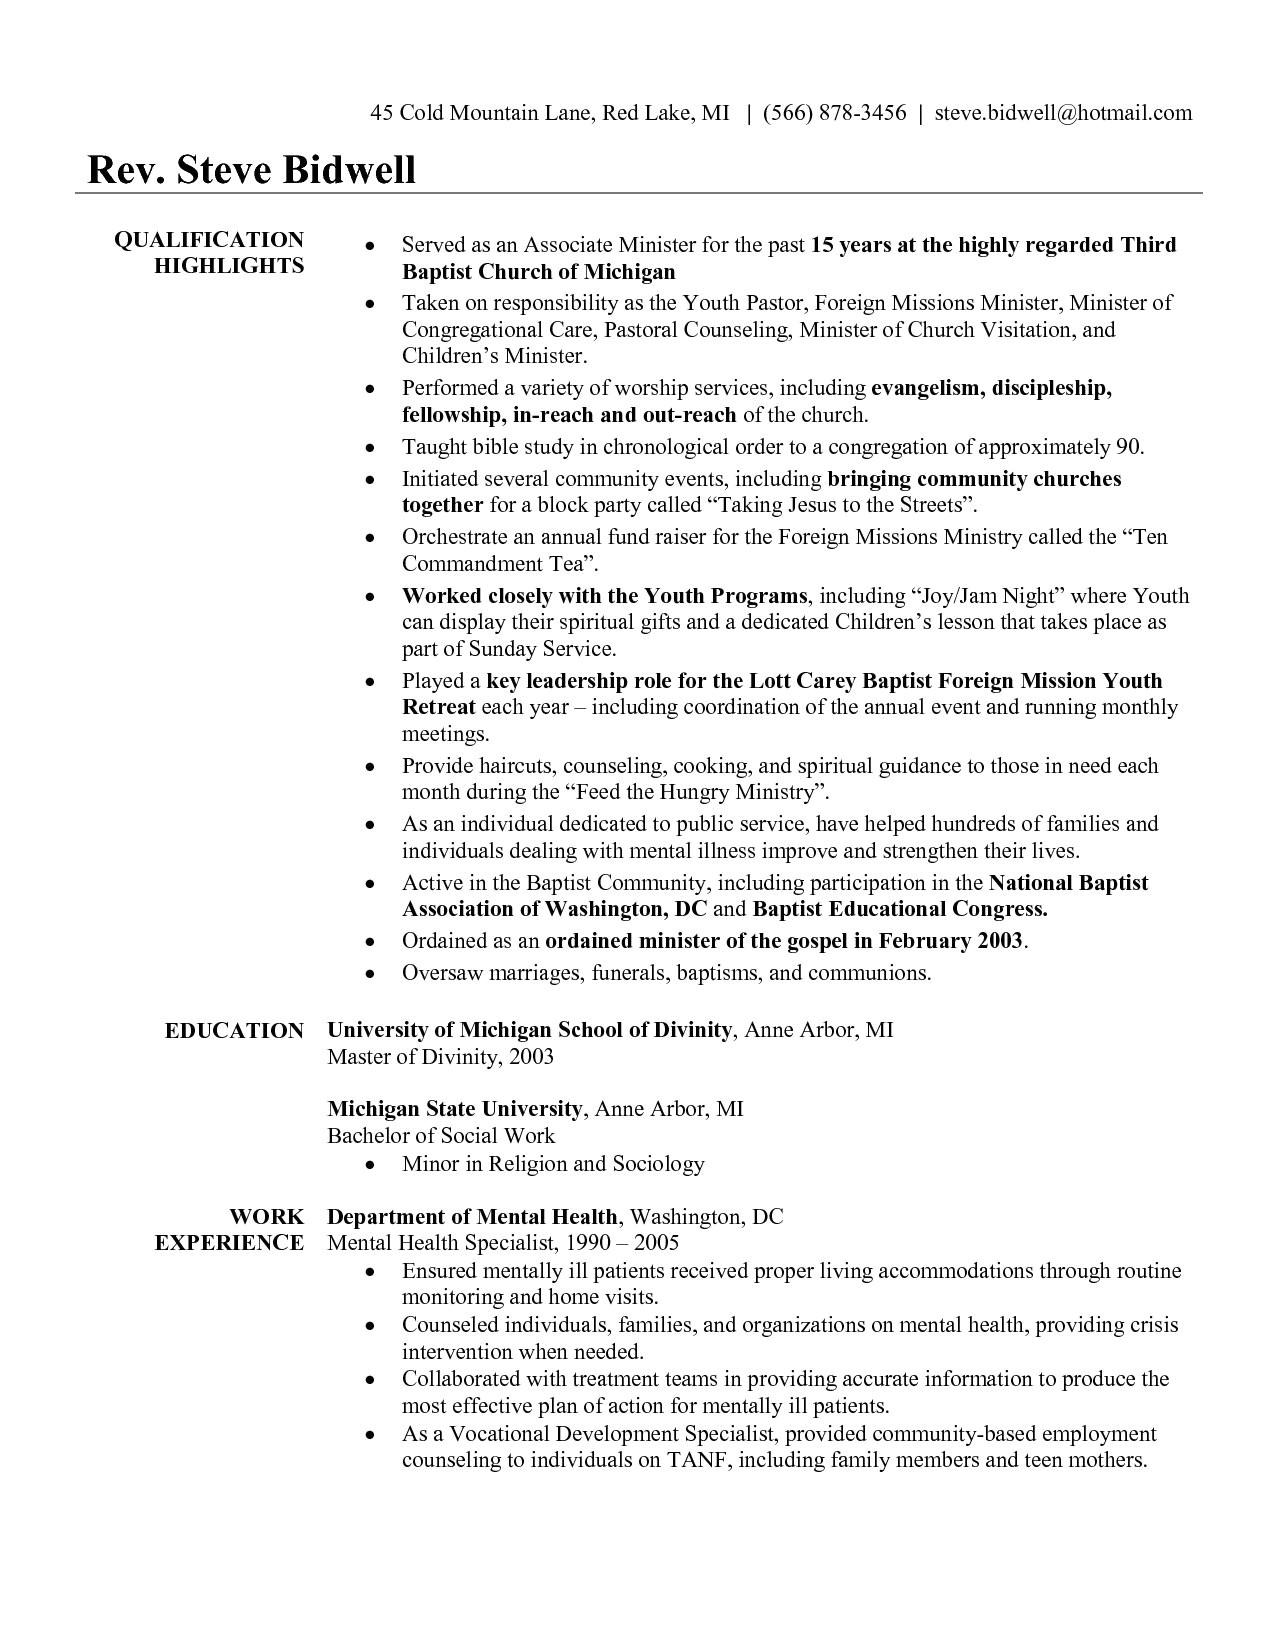 sample pastor resume